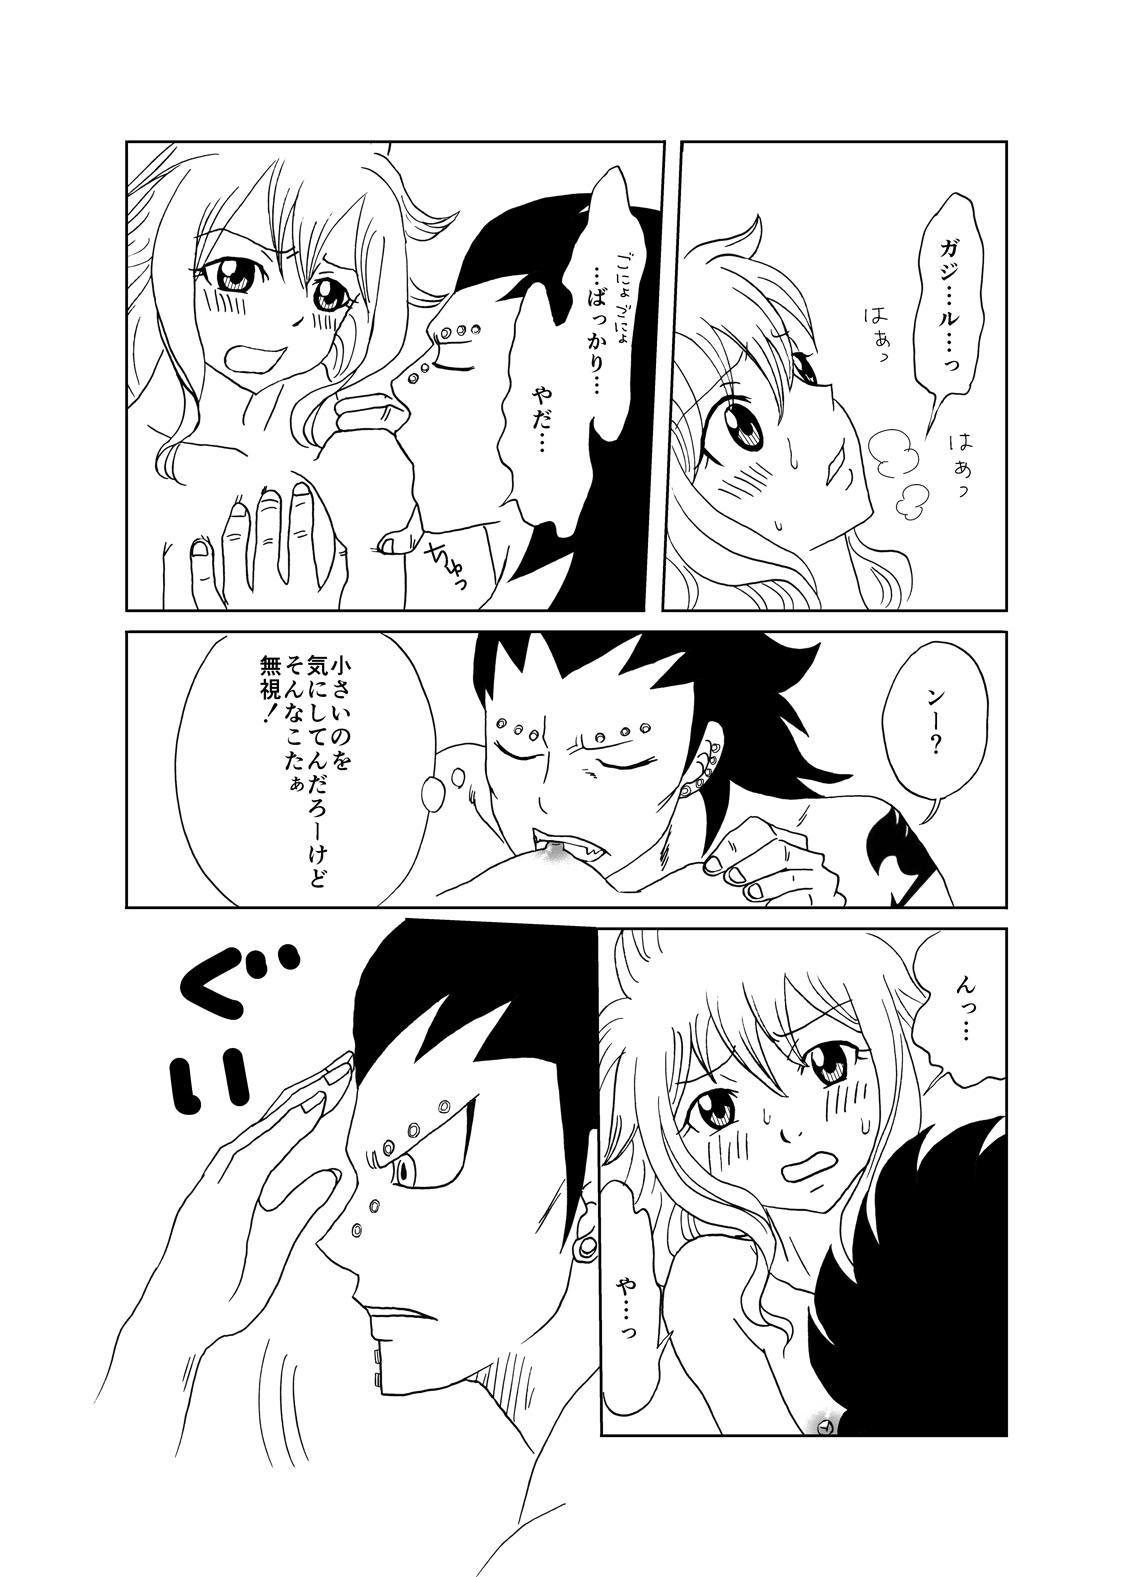 [Cashew] GajeeLevy Manga - Levy-chan ni Gohoushi (Fairy Tail) 9